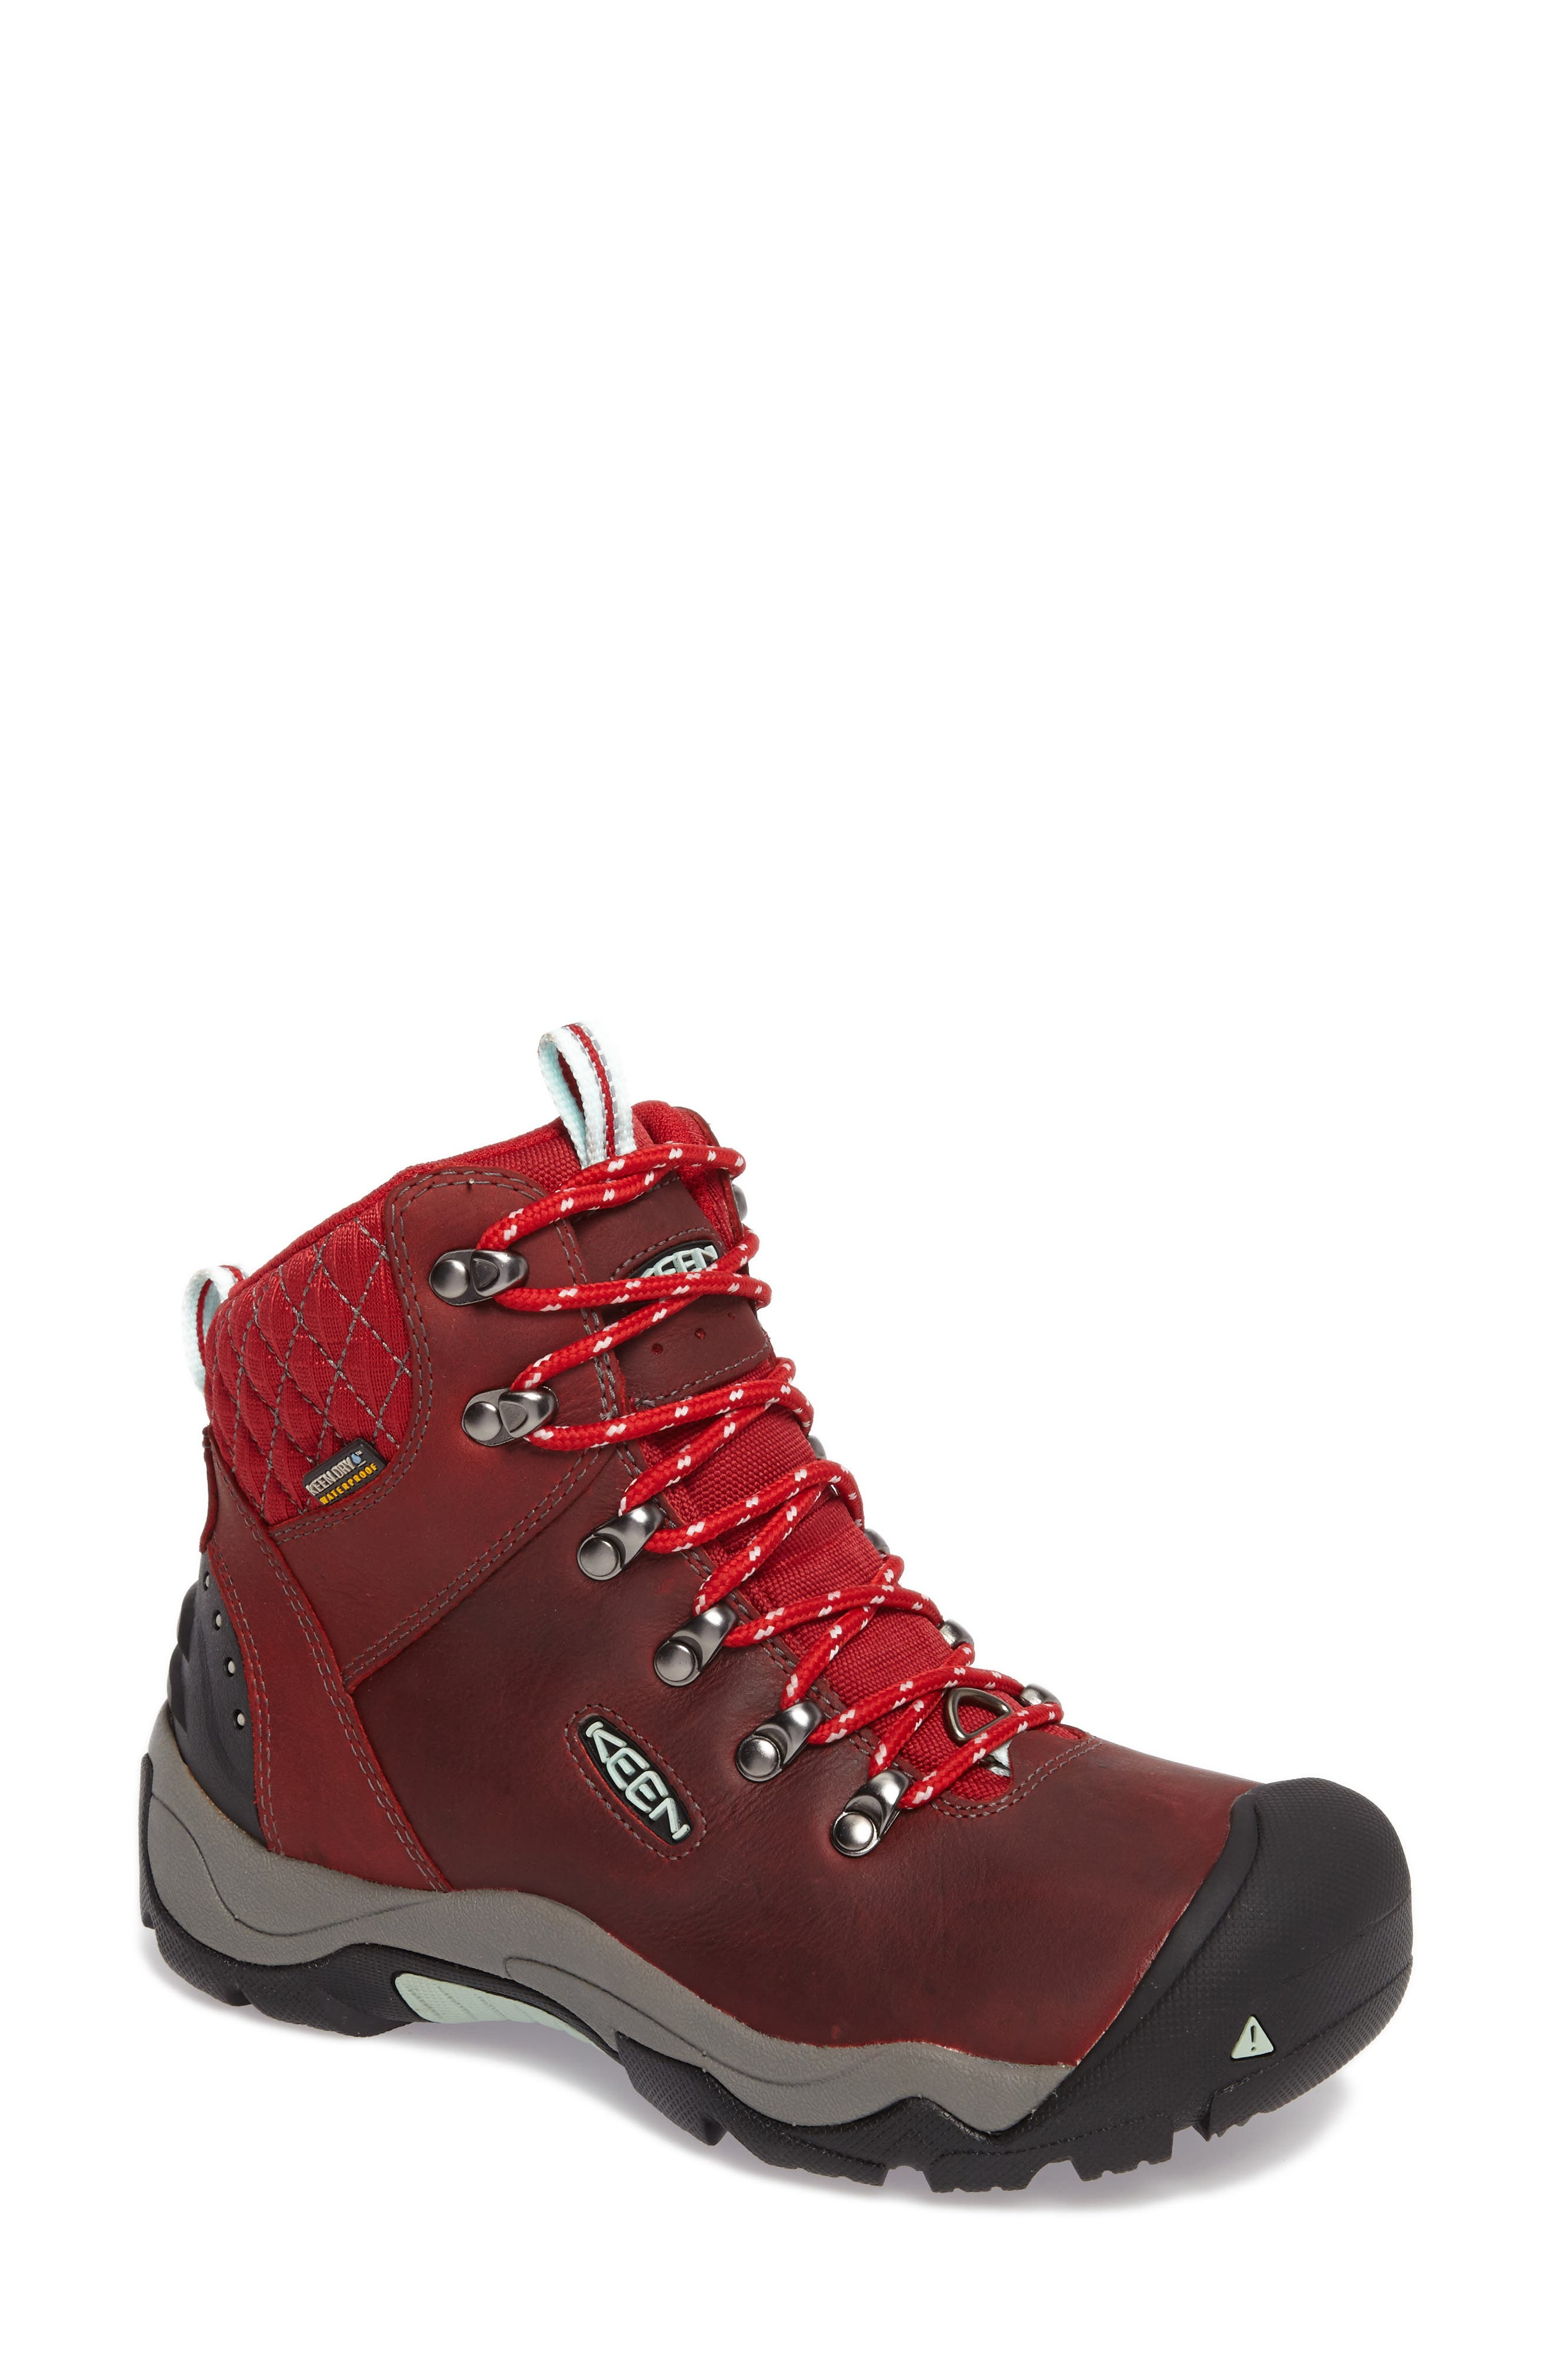 Main Image - Keen Revel III Waterproof Hiking Boot (Women)